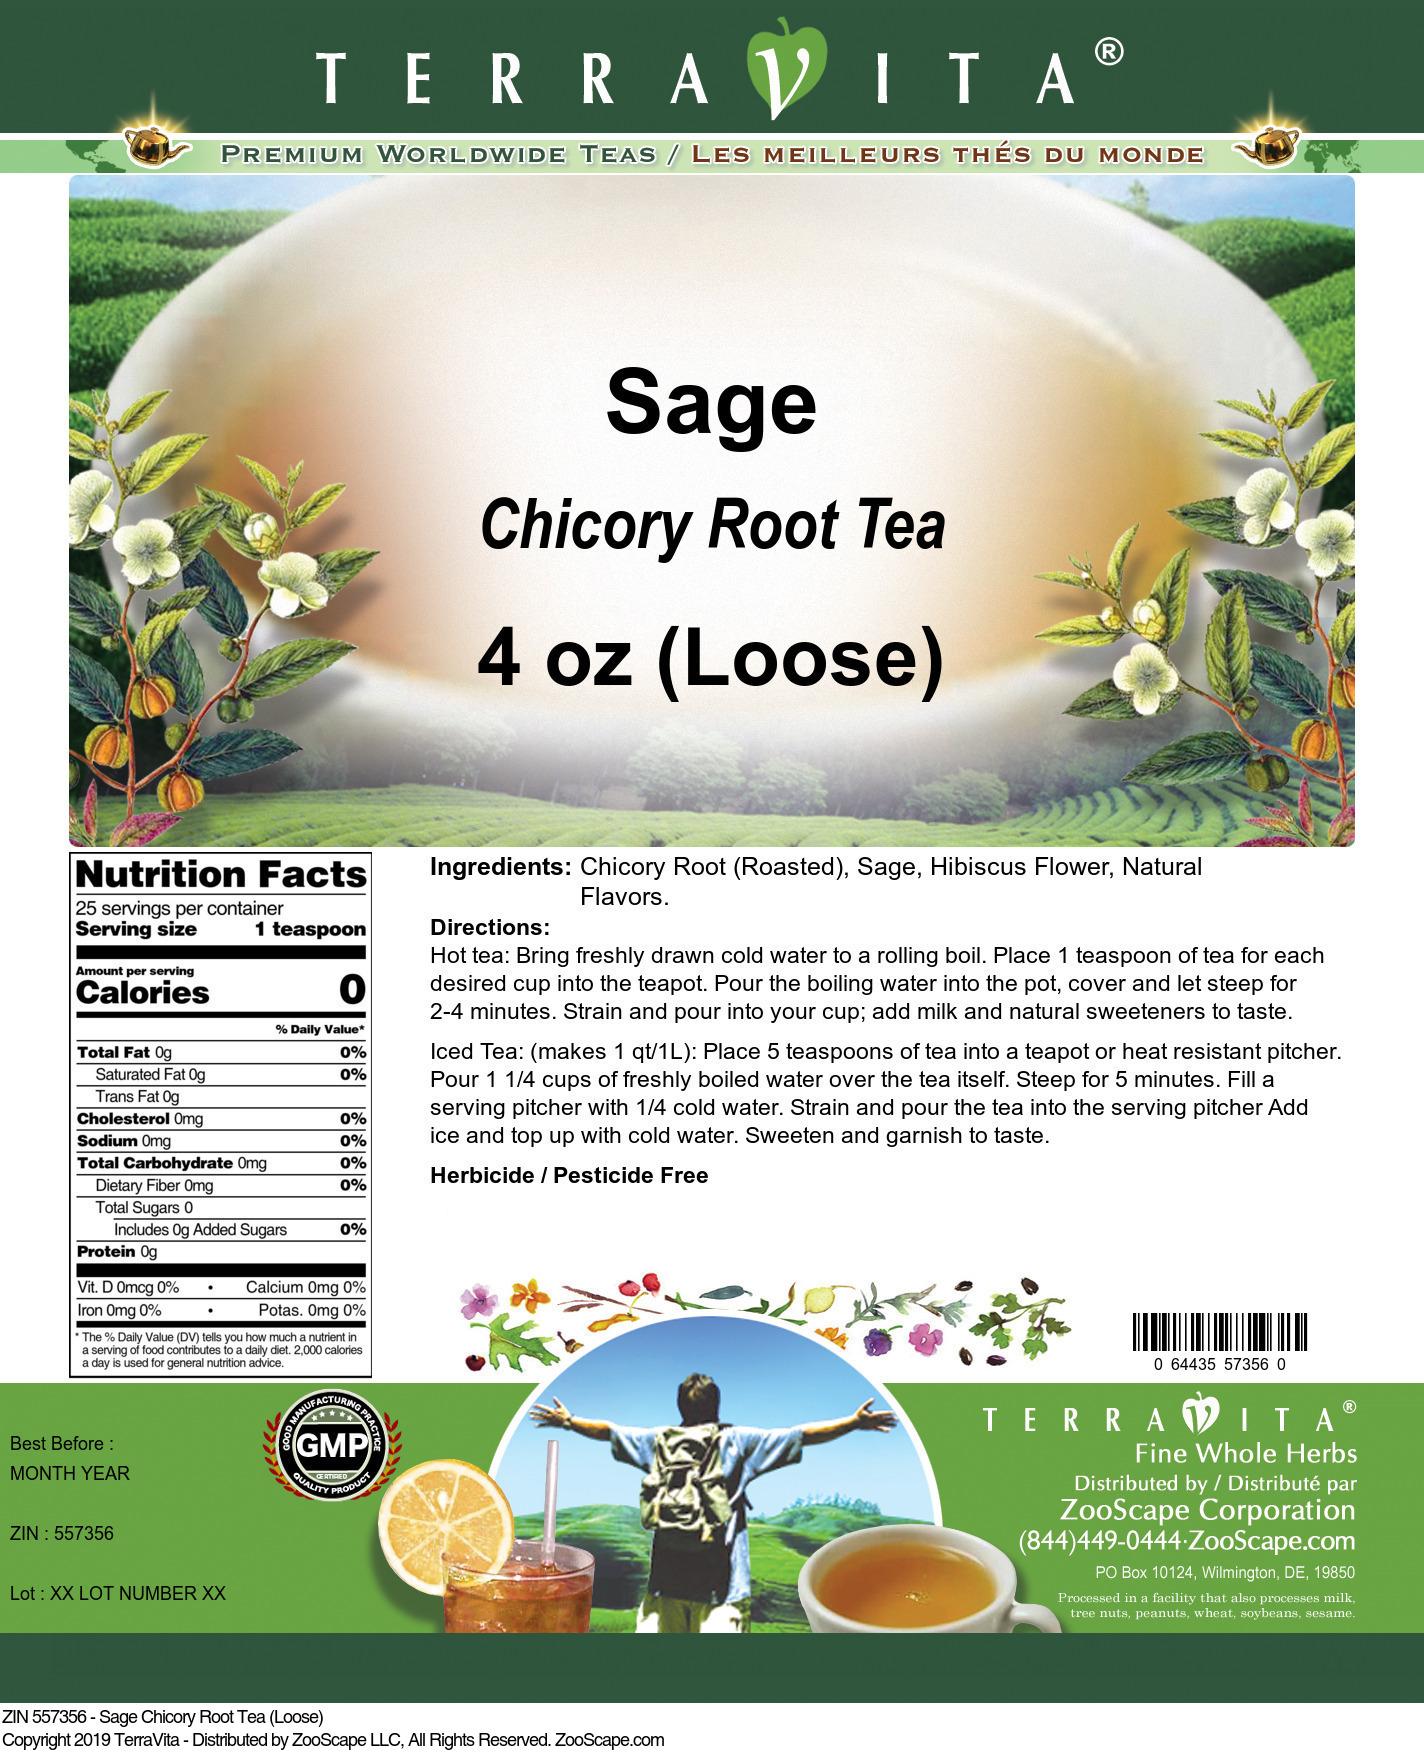 Sage Chicory Root Tea (Loose)